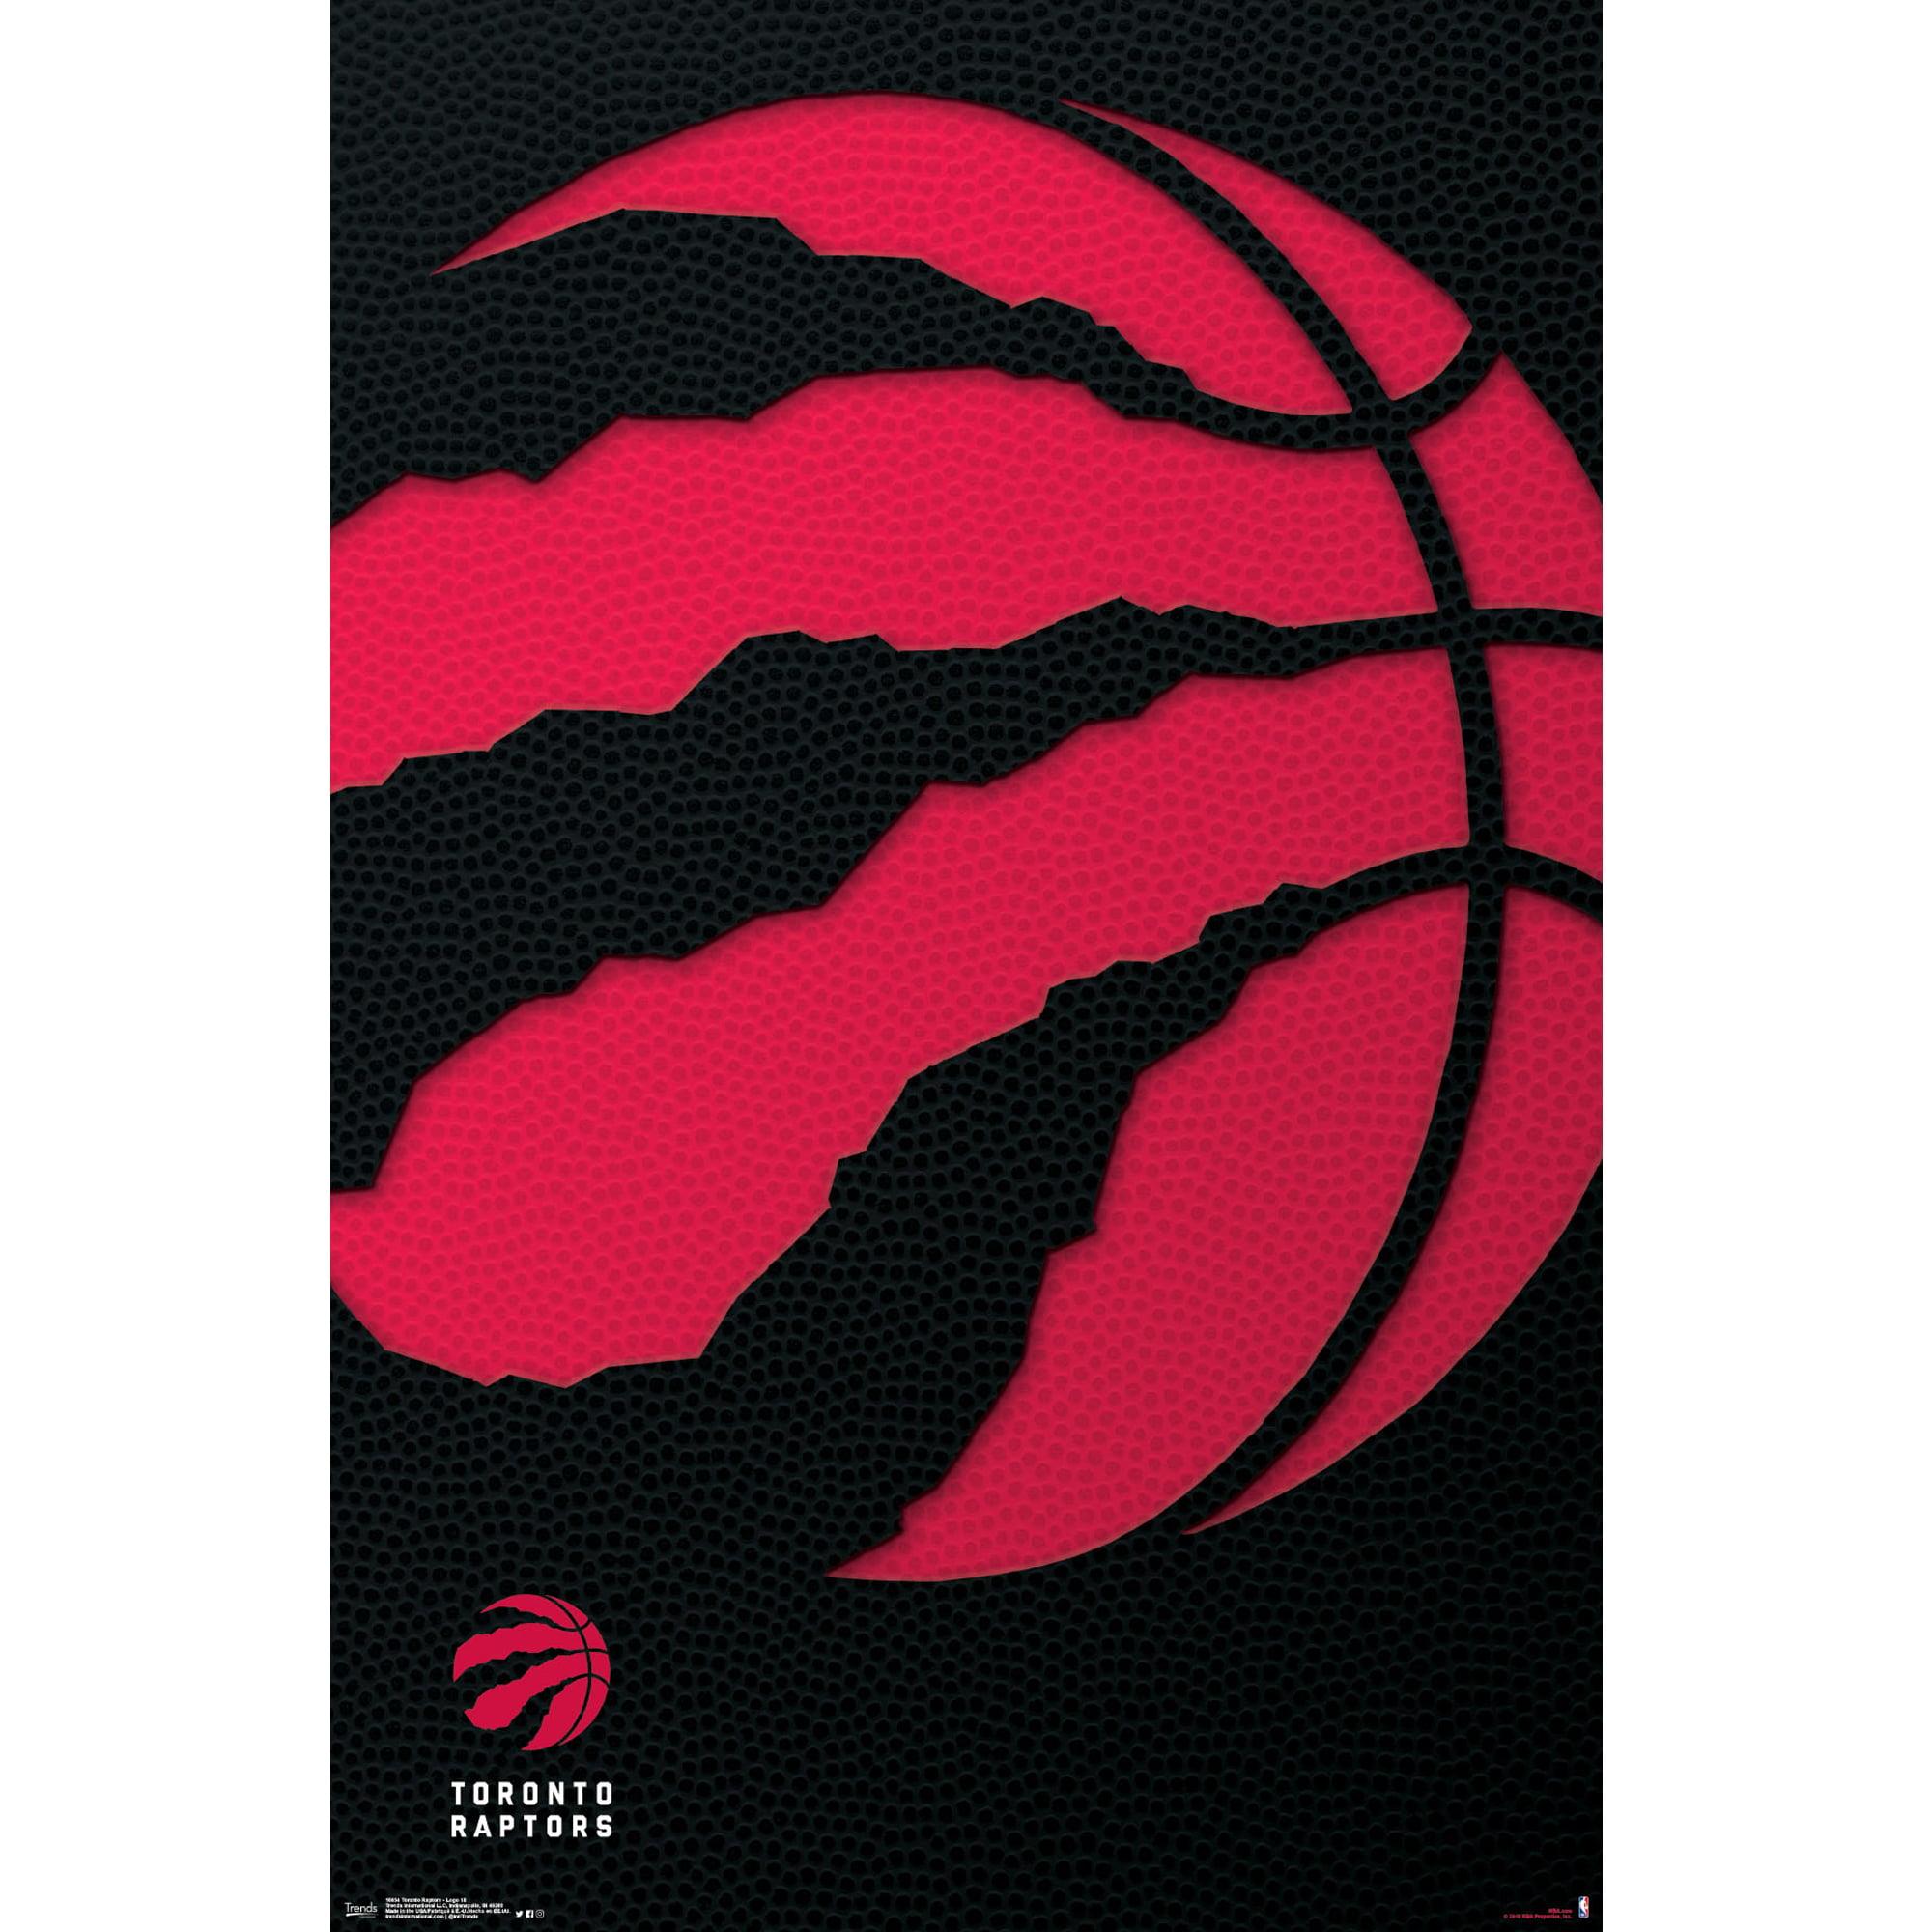 Toronto Raptors 22'' x 34'' Logo Team Poster - No Size